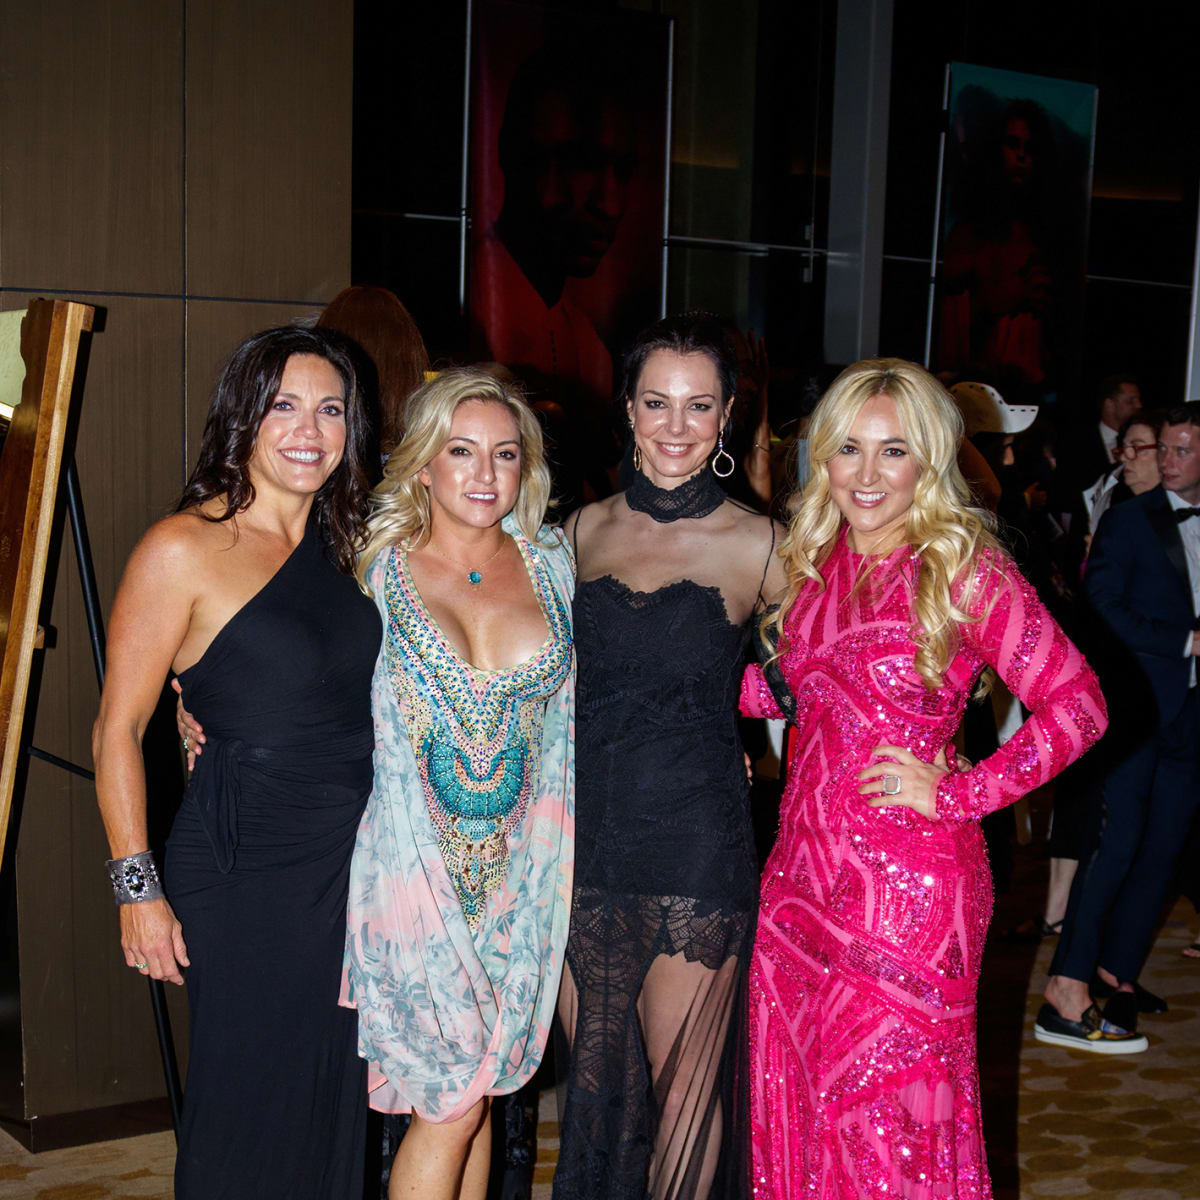 Manda Forbus, Olivia Cook, Brittanie Oleniczak, Vodi Cook at House of DIFFA 2018